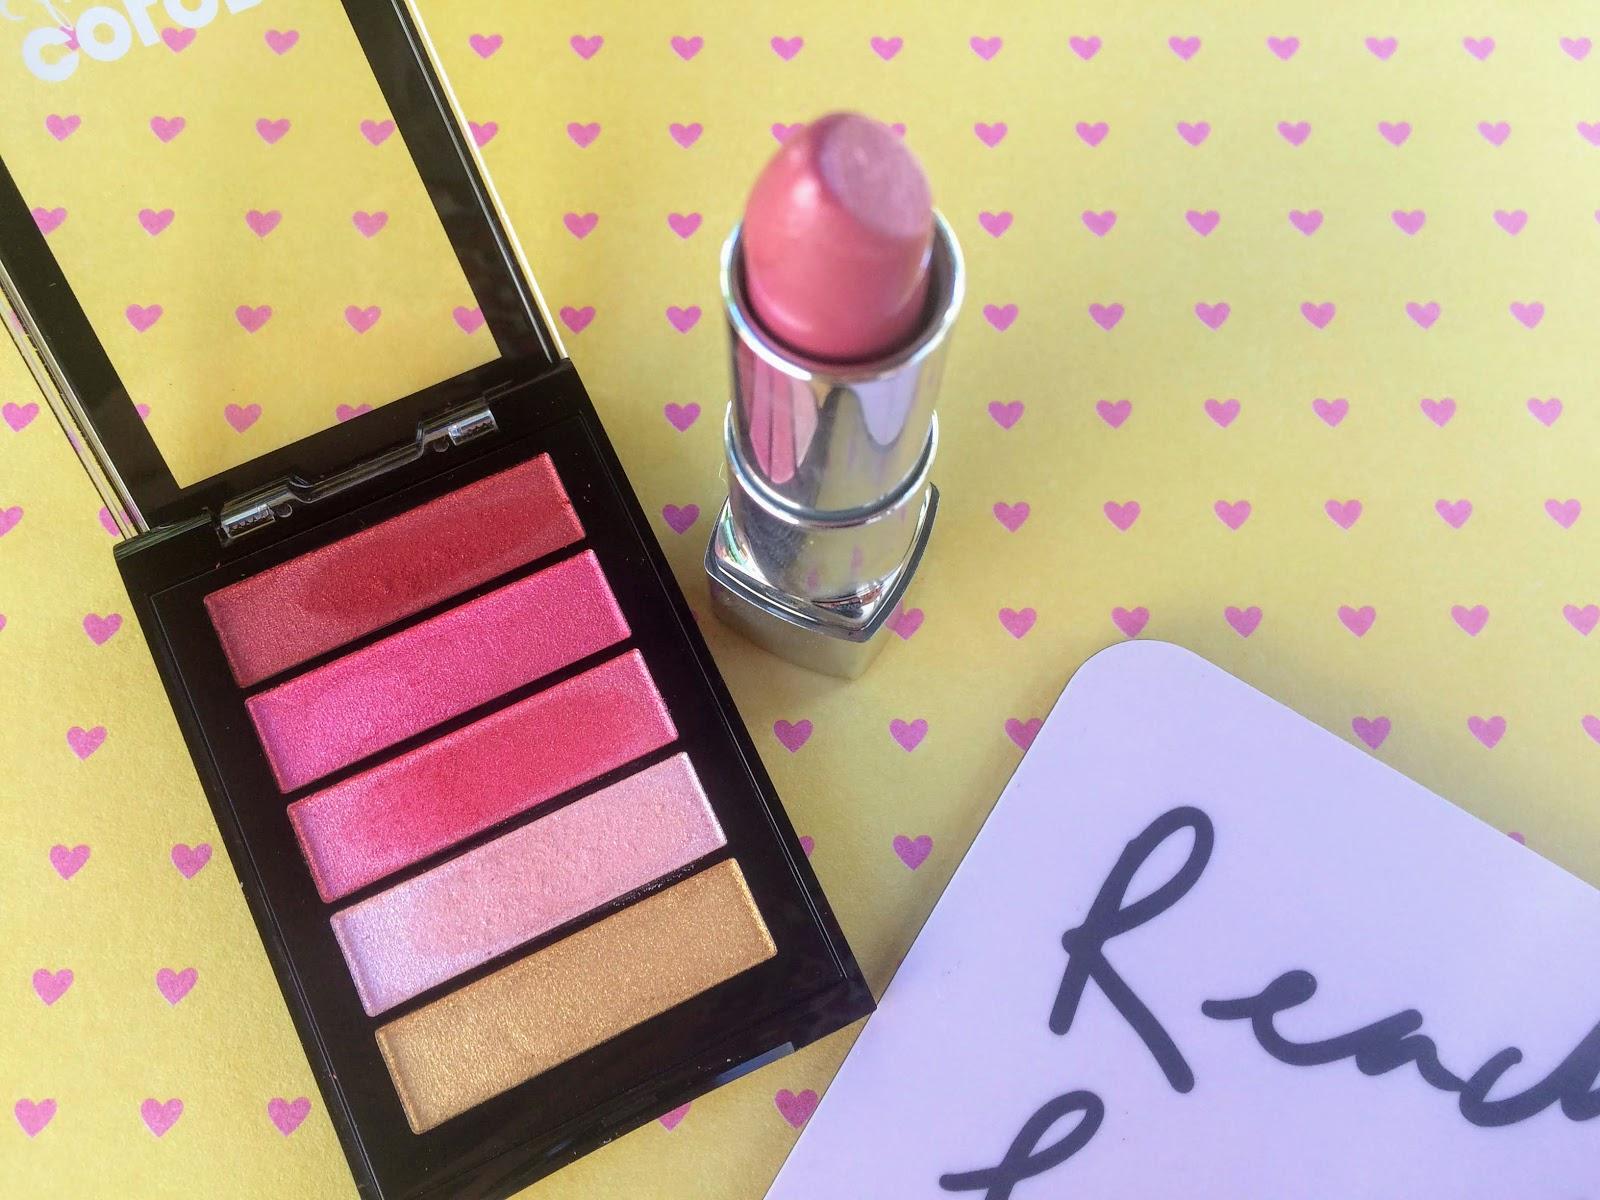 Revlon Lip Powder, Rimmel lipstick